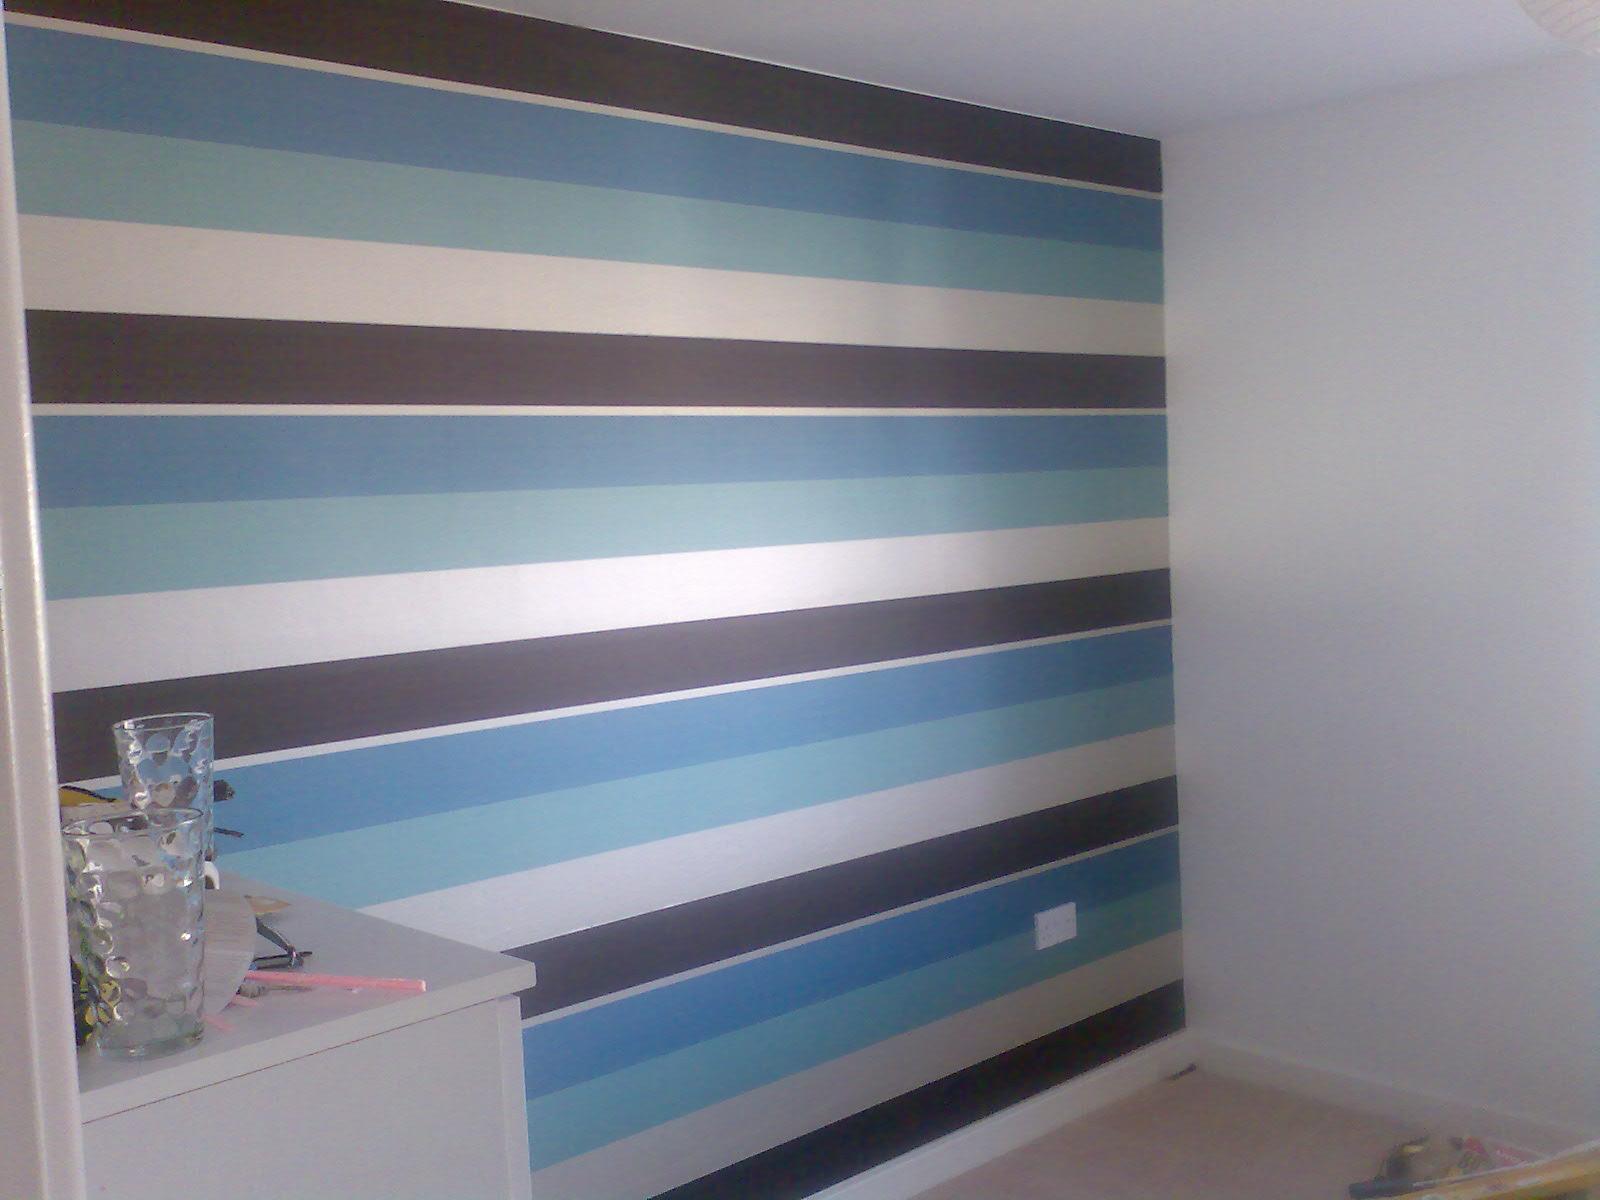 Horizontal Stripe Wallpaper Wallpaper Full HD 1600x1200